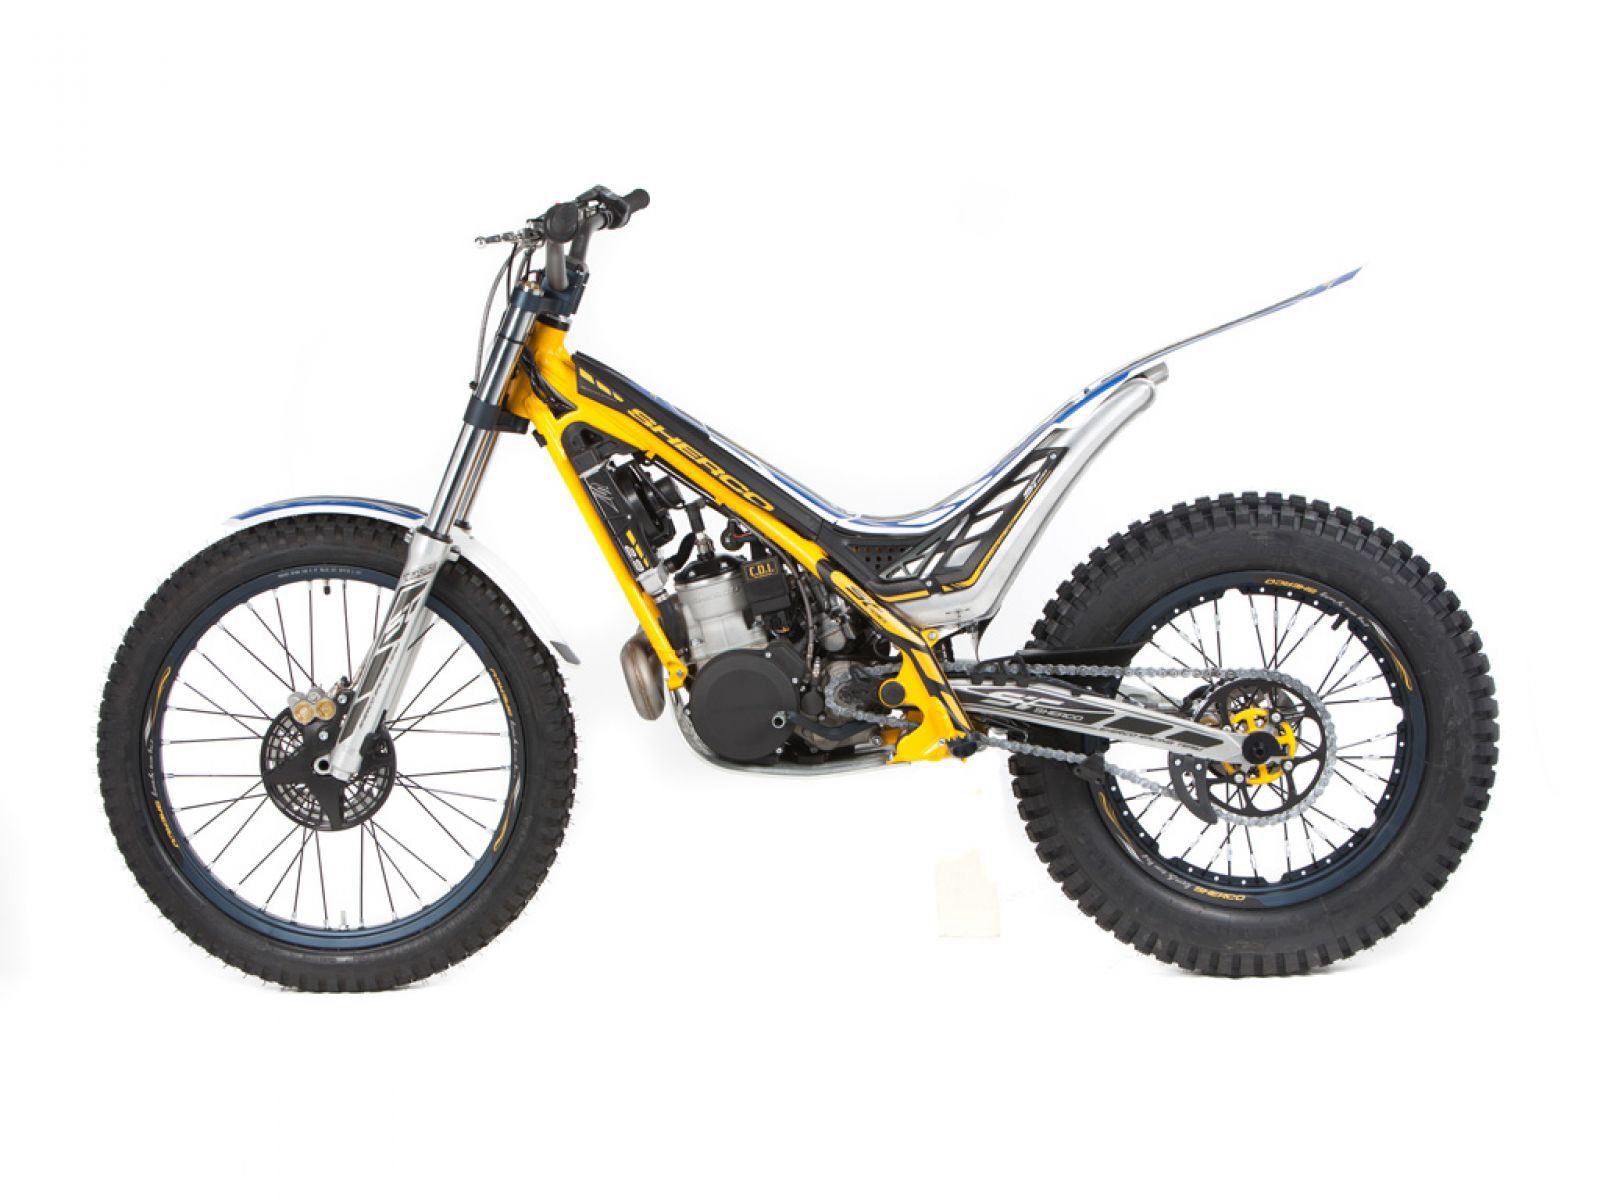 sherco 250cc trial bike motorcycle trials trial bike. Black Bedroom Furniture Sets. Home Design Ideas